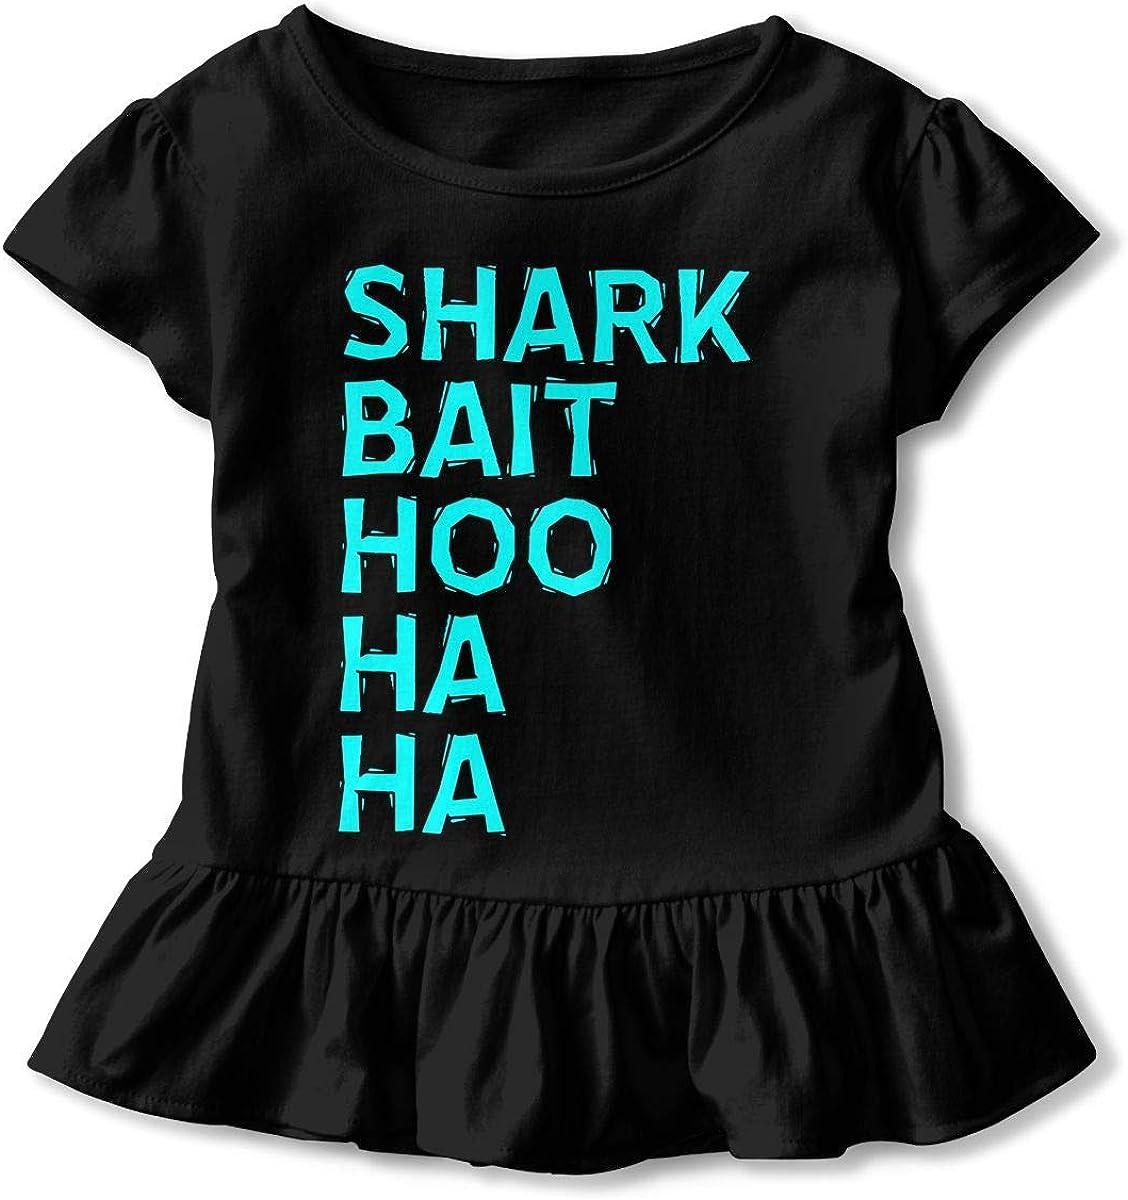 Girls Short Sleeve Shark Bait Hoo Ha Ha T-Shirts, Ruffled Blouse Clothes with Flounces, 2-6T